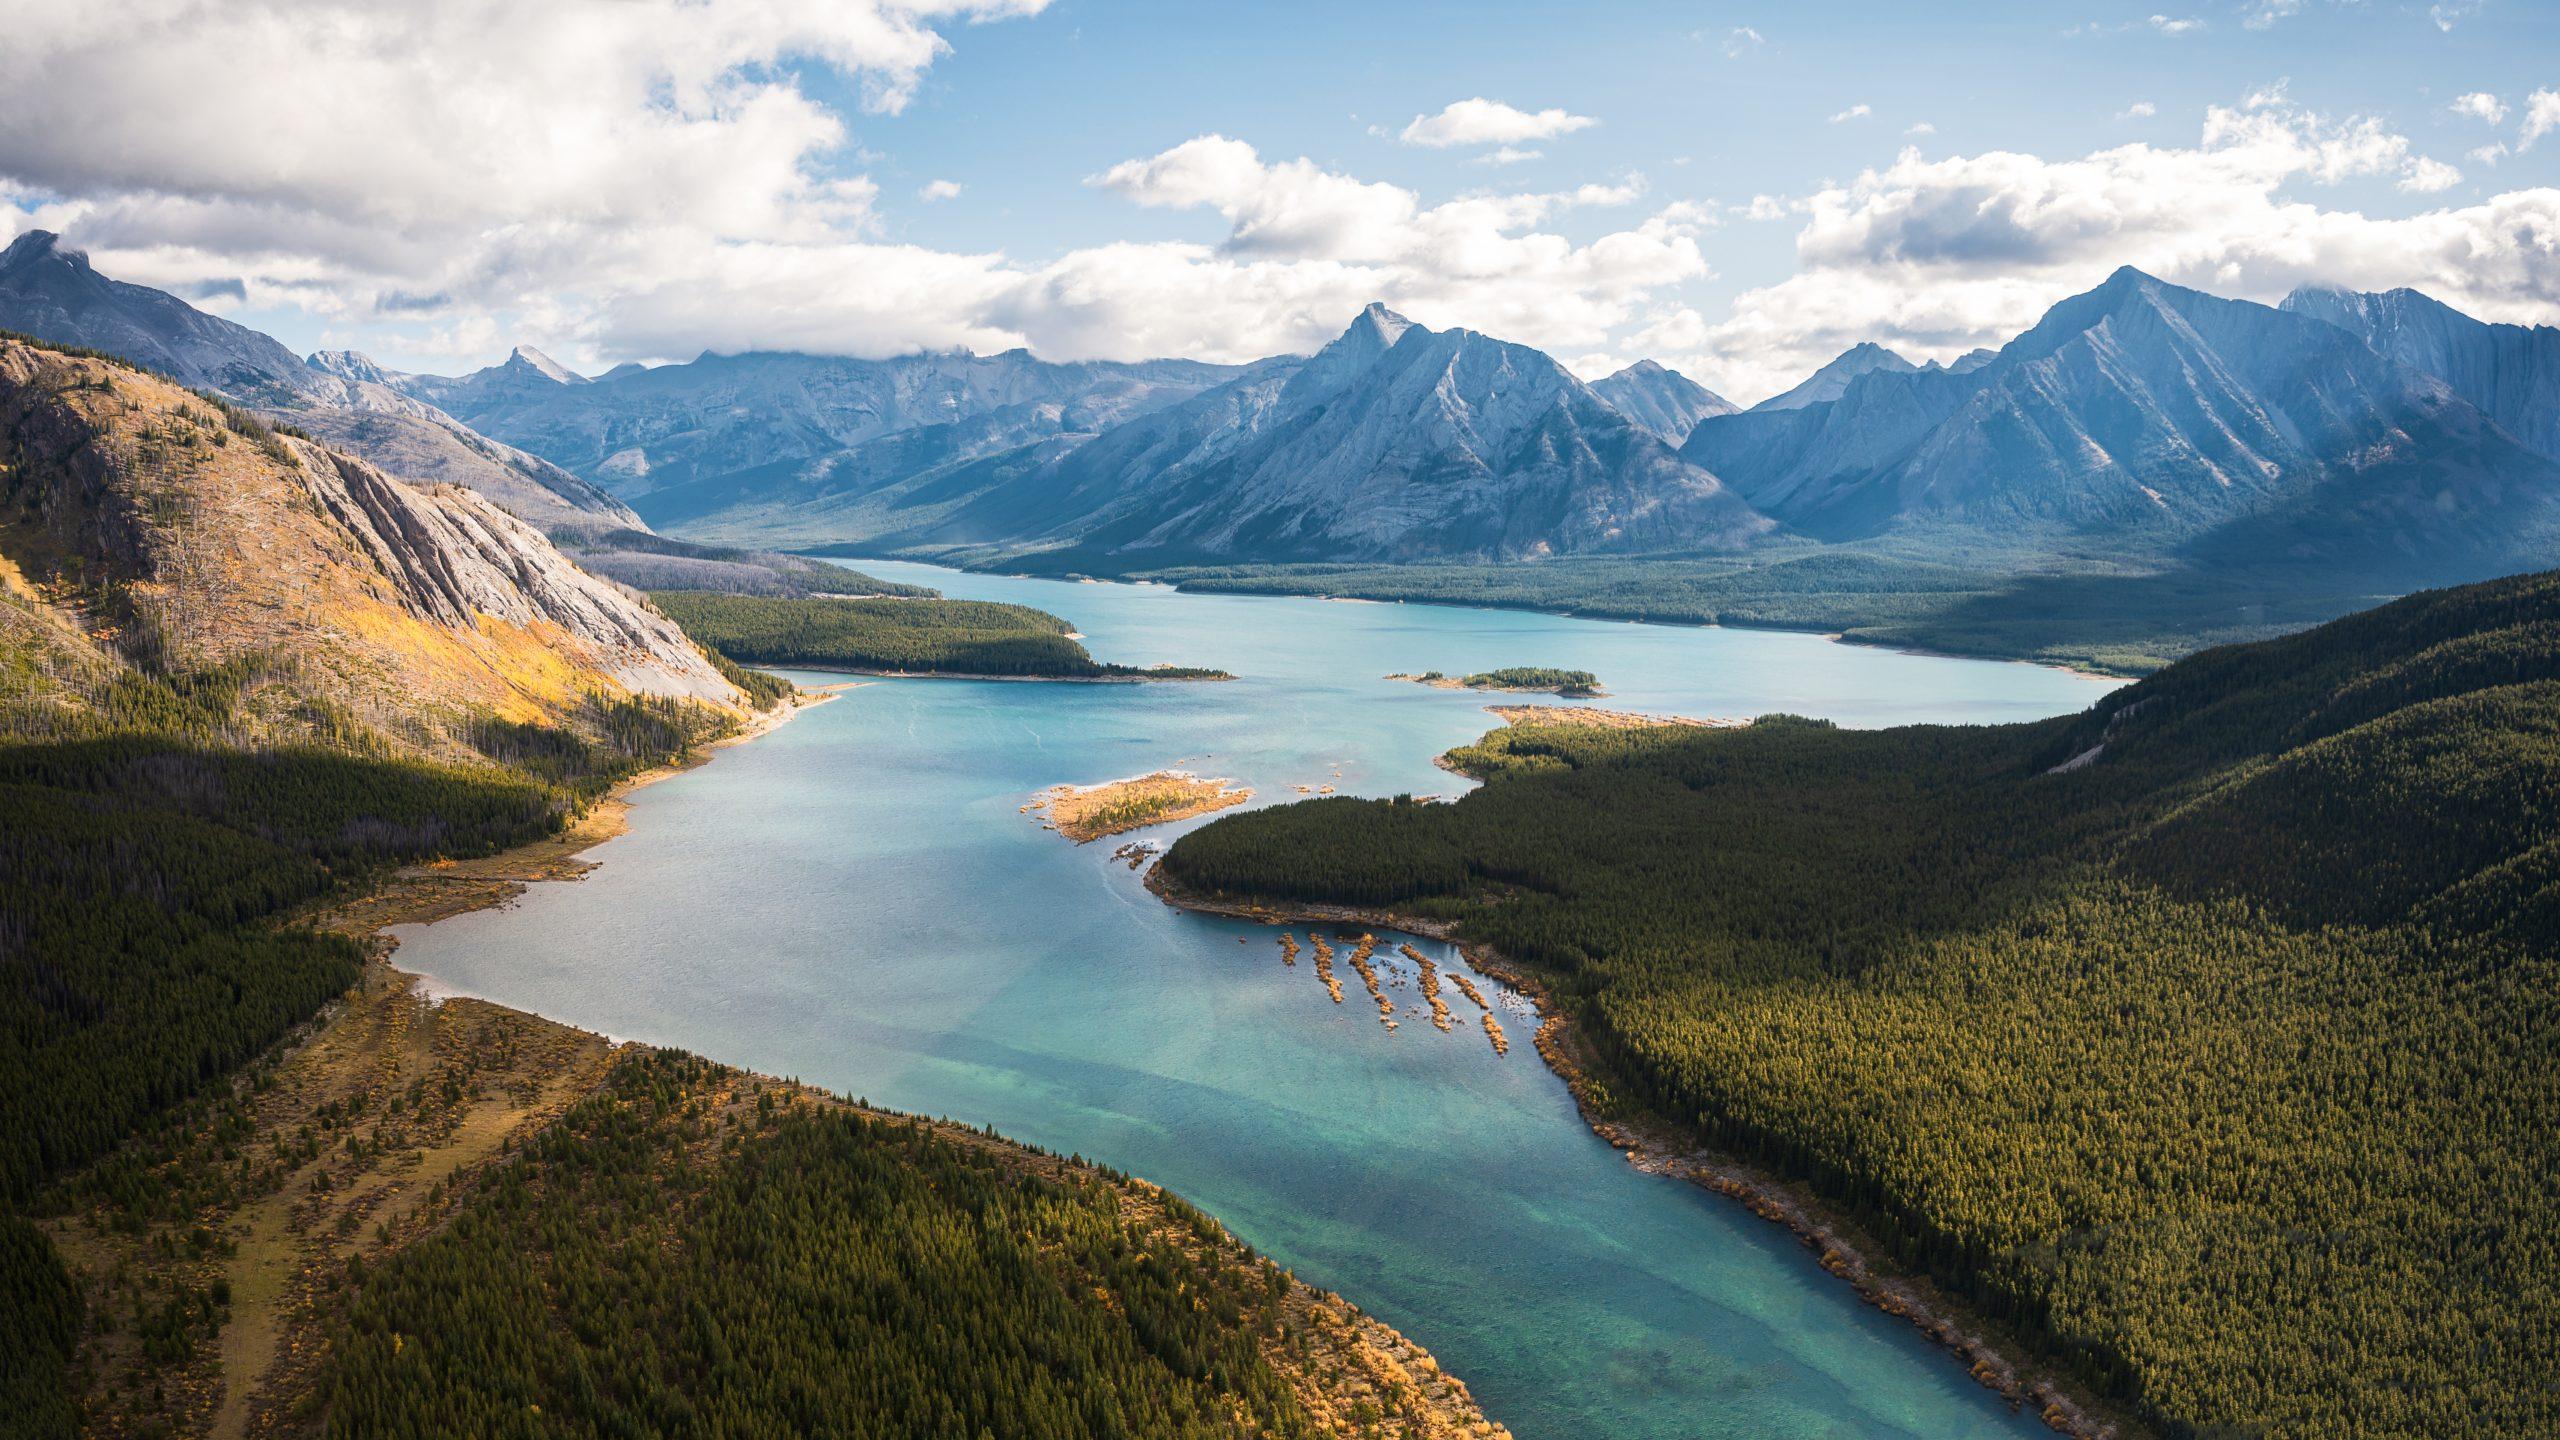 Assiniboine provincial park, Alberta, Canada